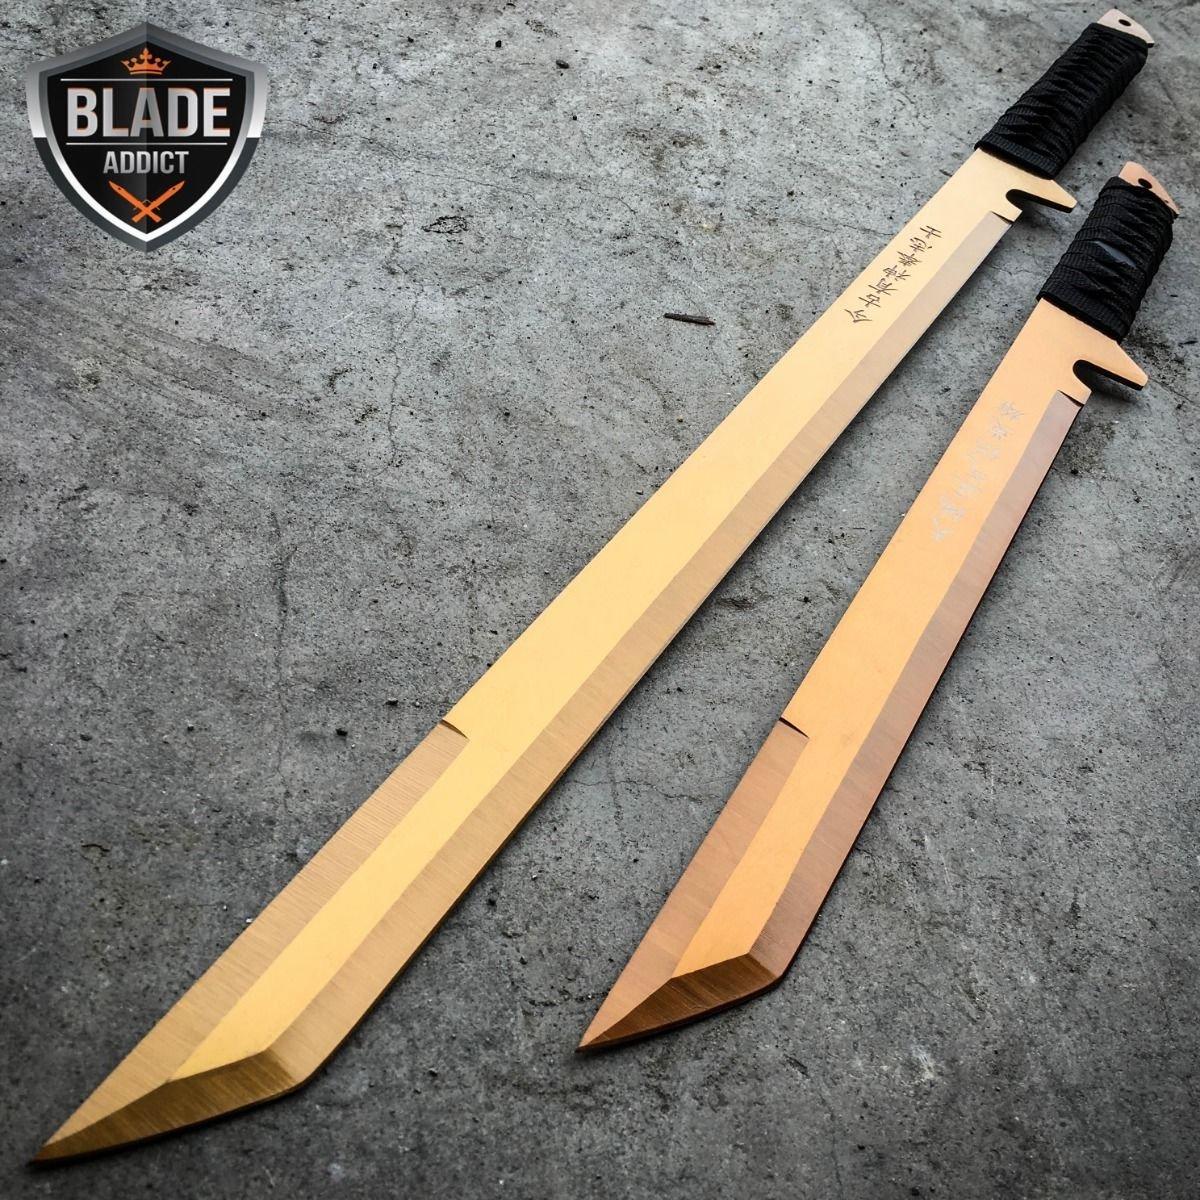 New 27'' & 18'' NINJA SWORD SET Samurai Machete COMBAT FANTASY EcoGift Nice Knife with Sharp Blade + Sheath GOLD SET- Great For Fun And Practical Use